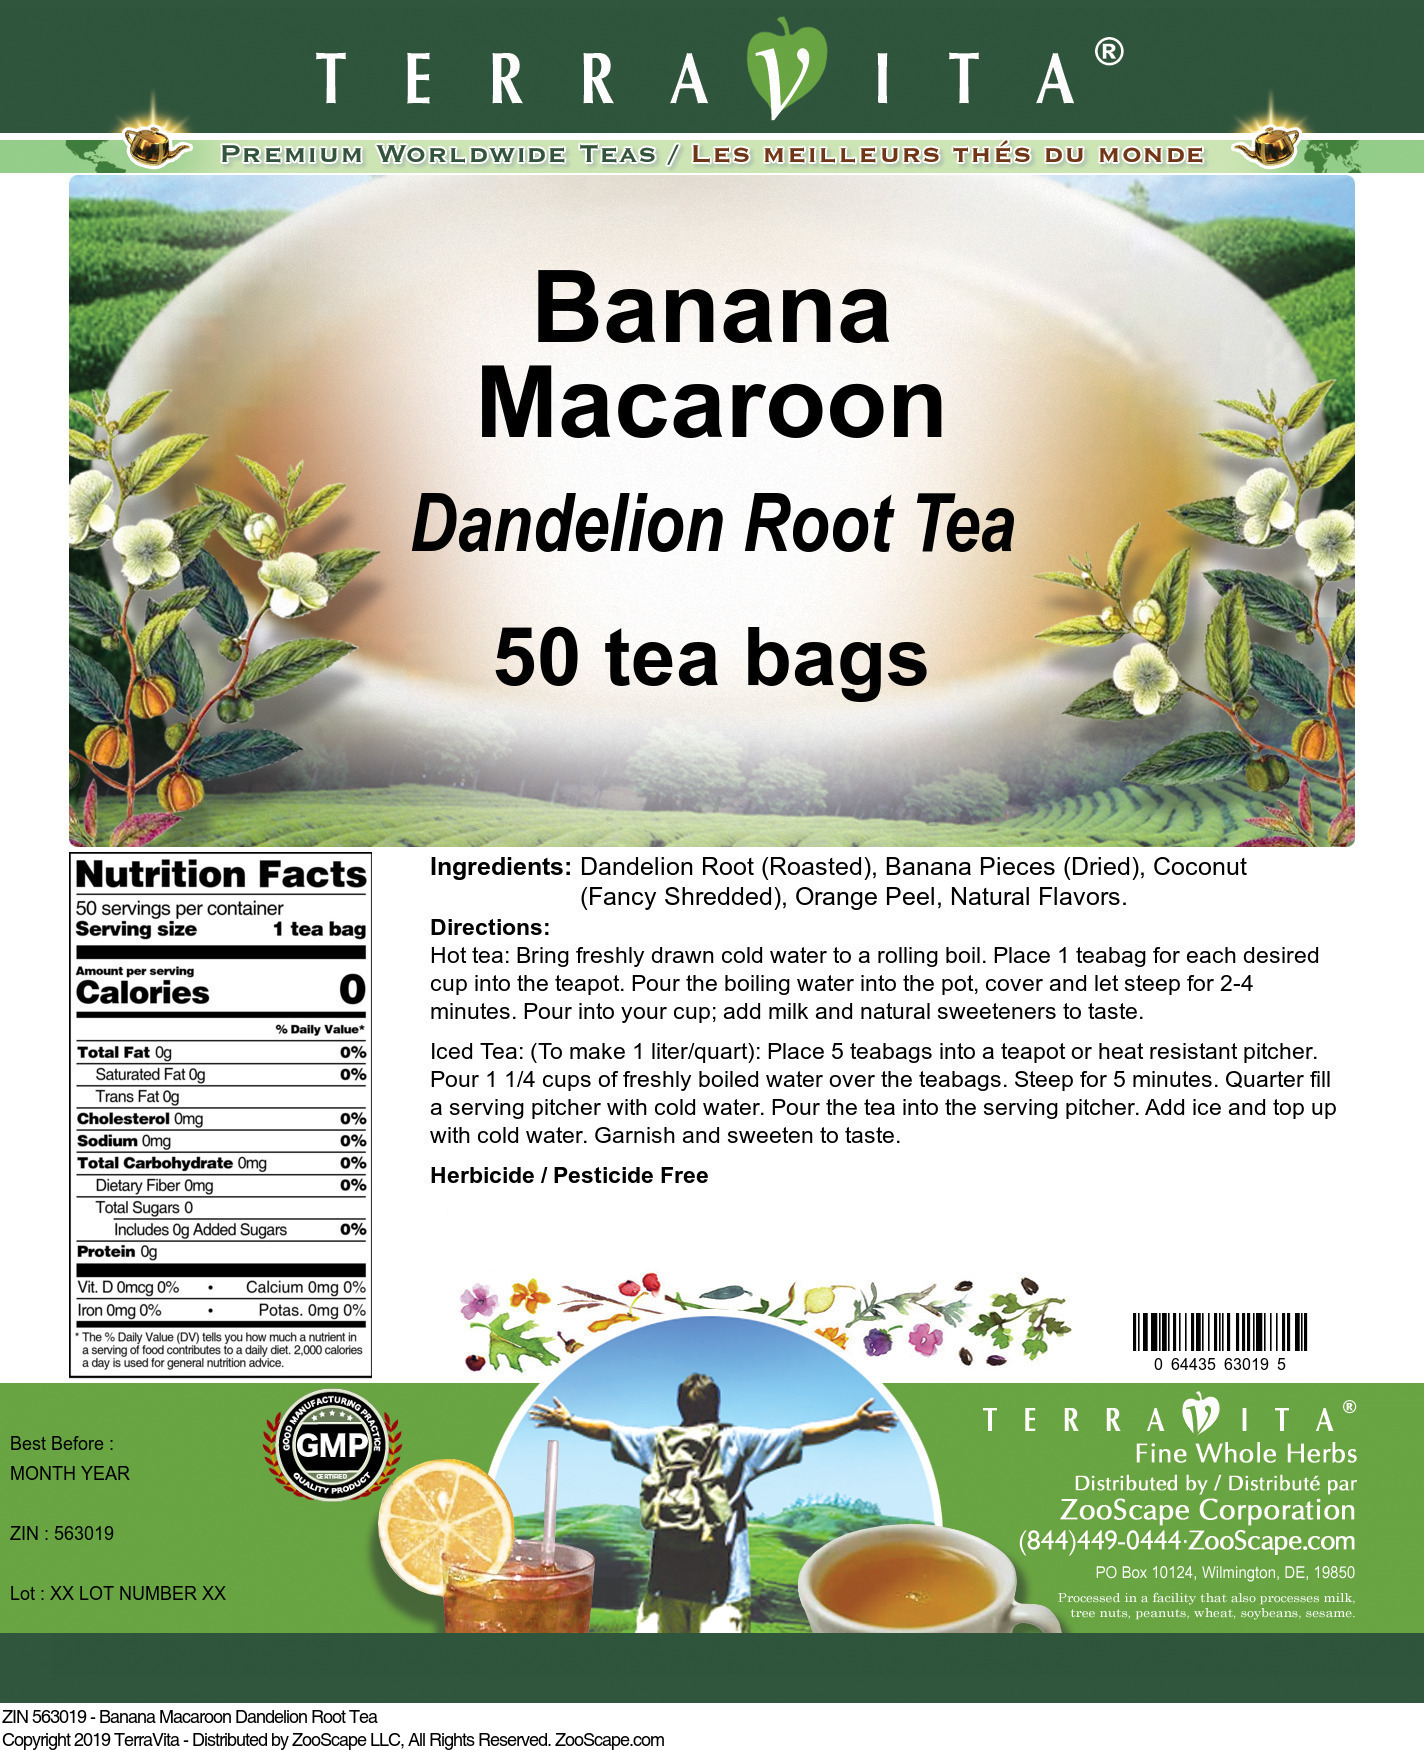 Banana Macaroon Dandelion Root